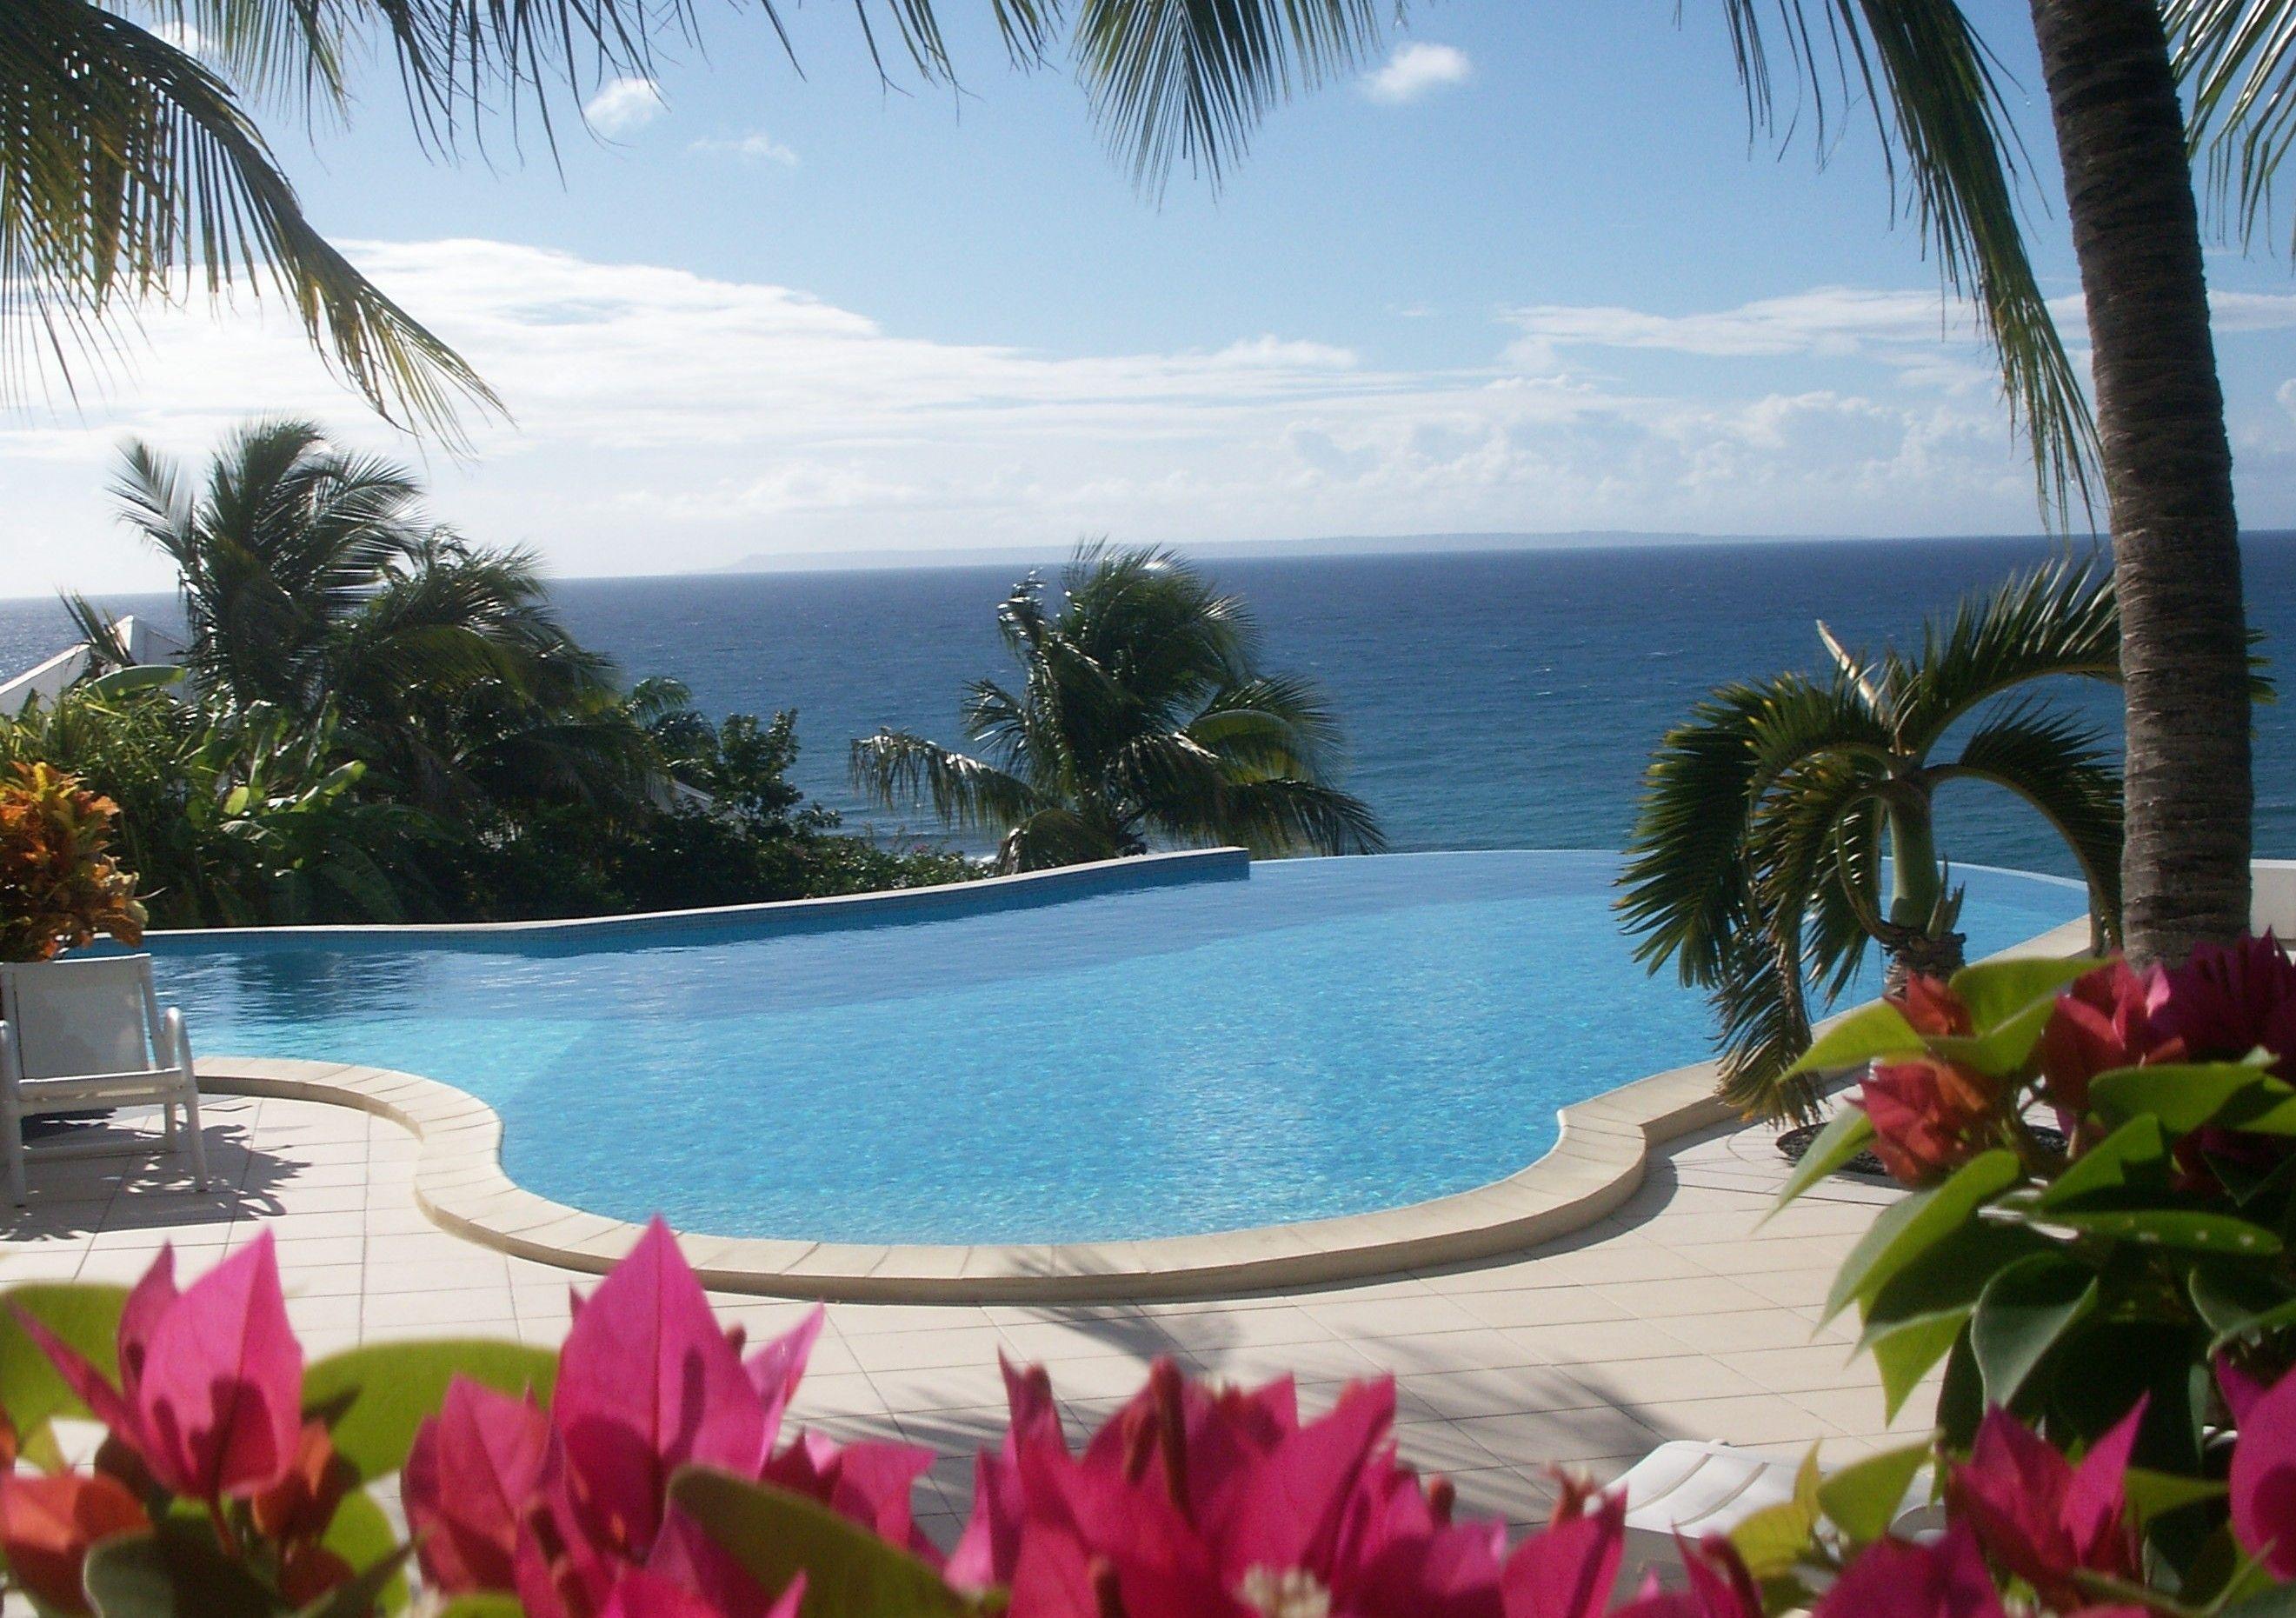 La piscine de l 39 h tel for Aquarelle piscine hotel seneffe